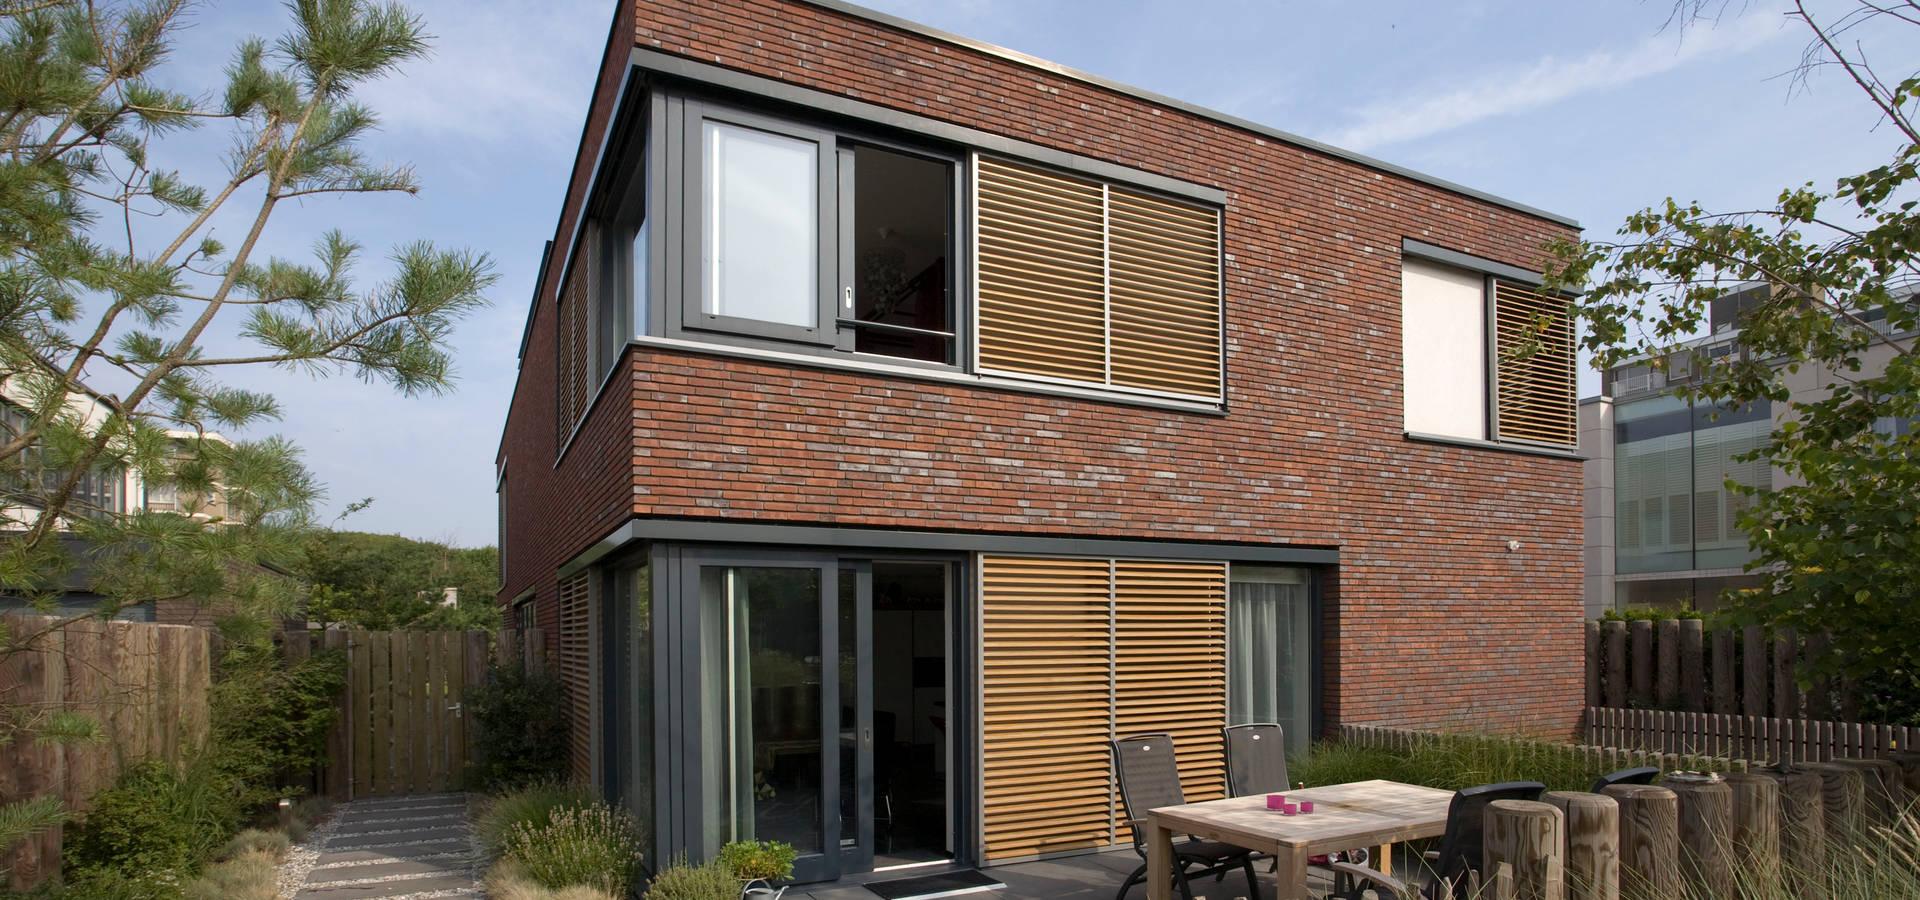 Studio Leon Thier architectuur / interieur